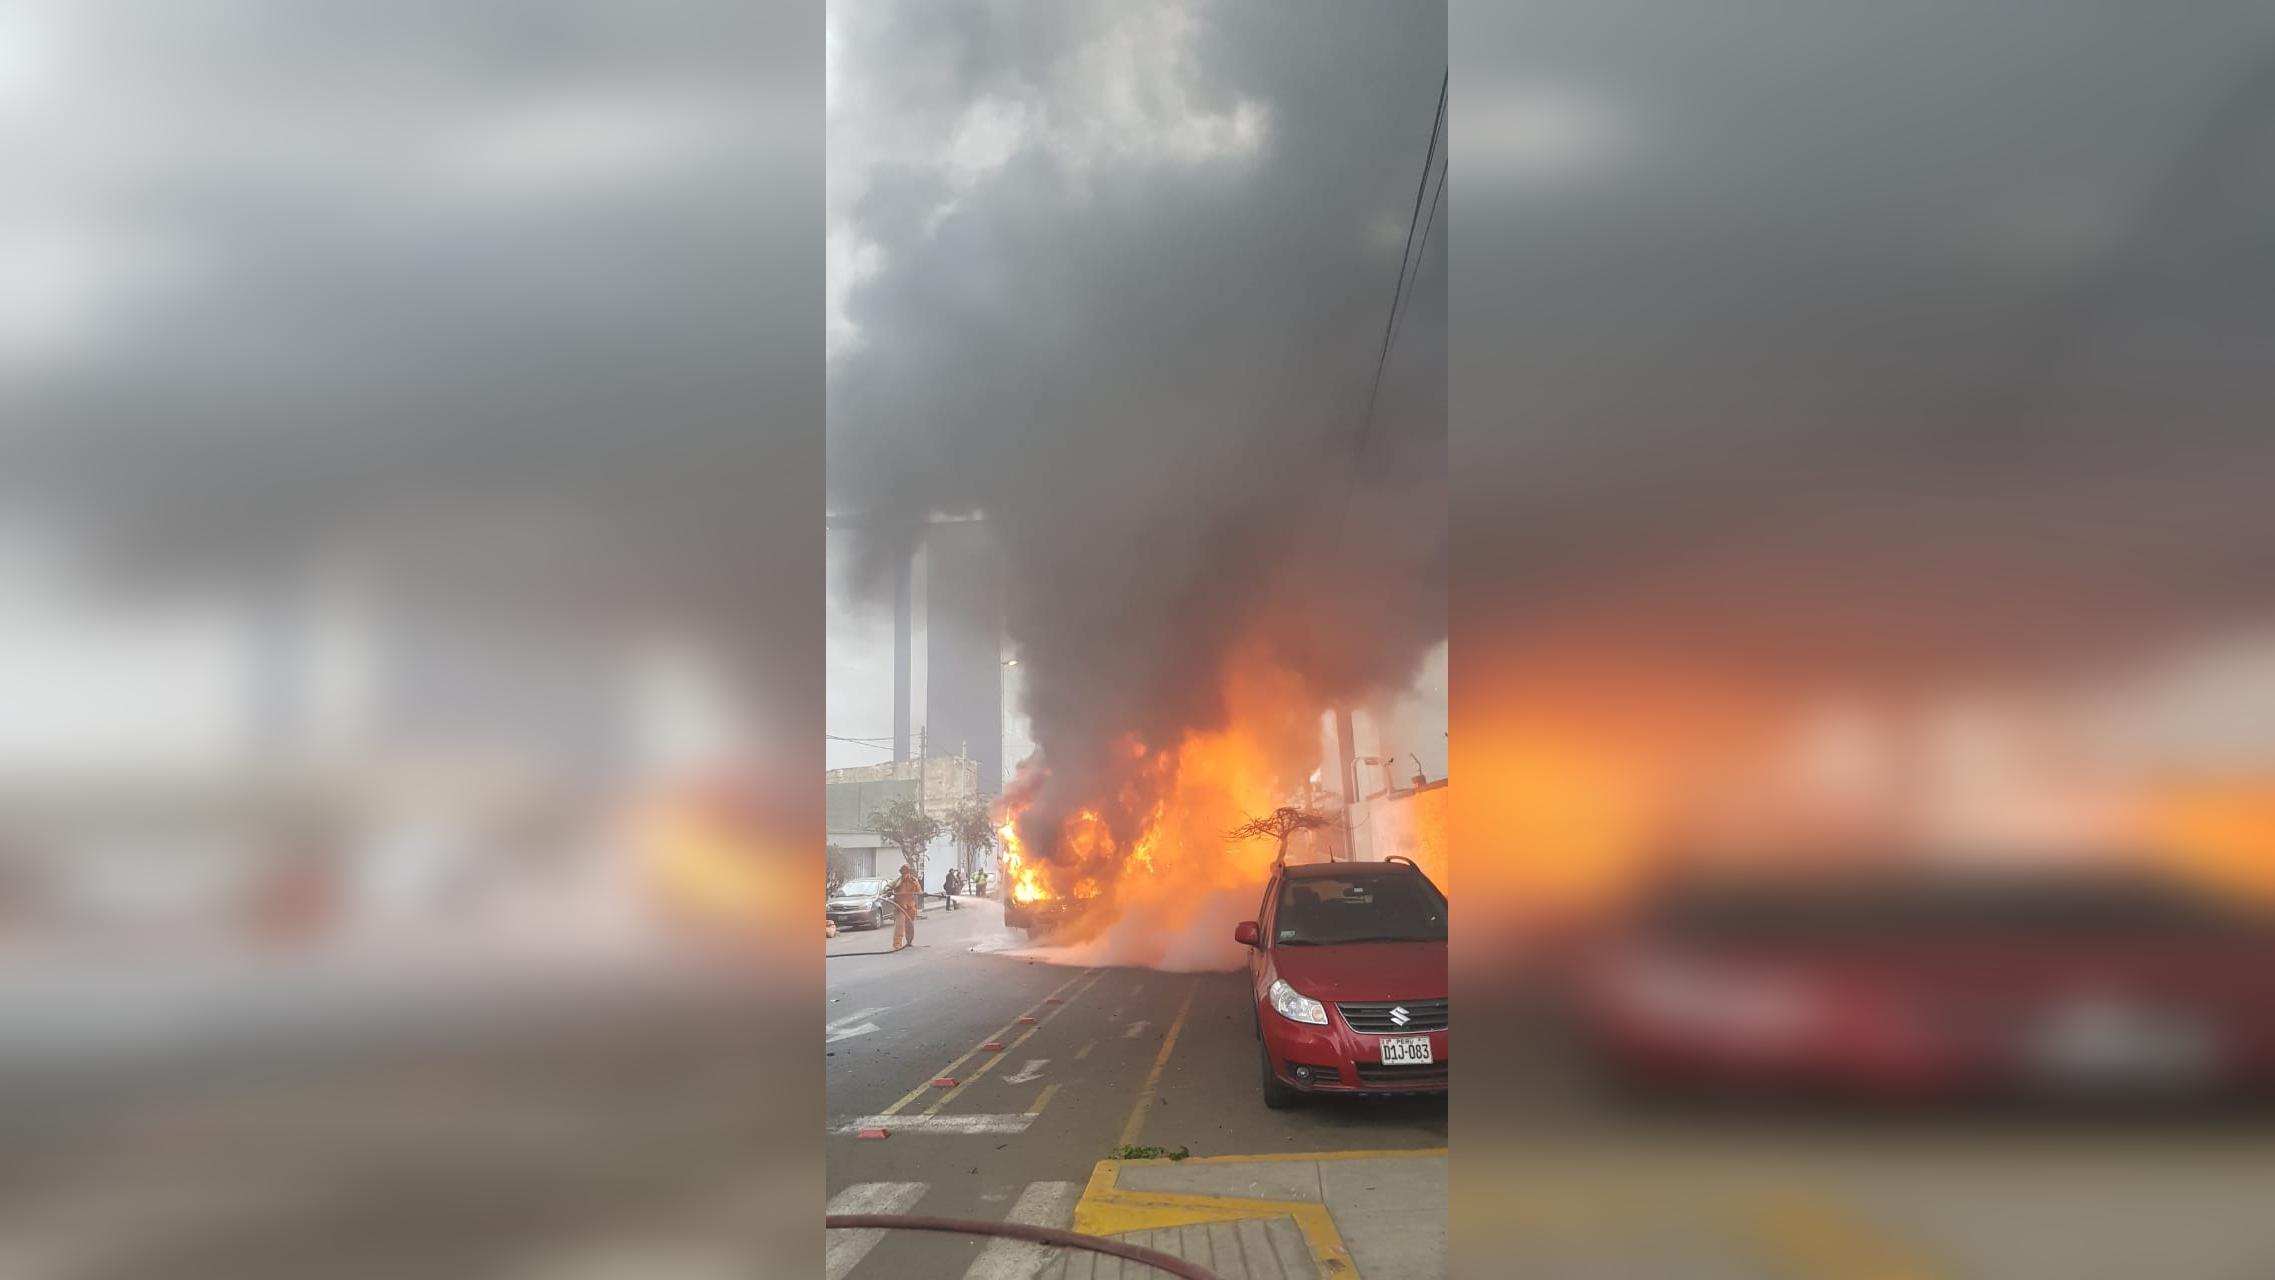 El incendio se produjo a la altura de la cuadra 17 de la avenida Petit Thouars.